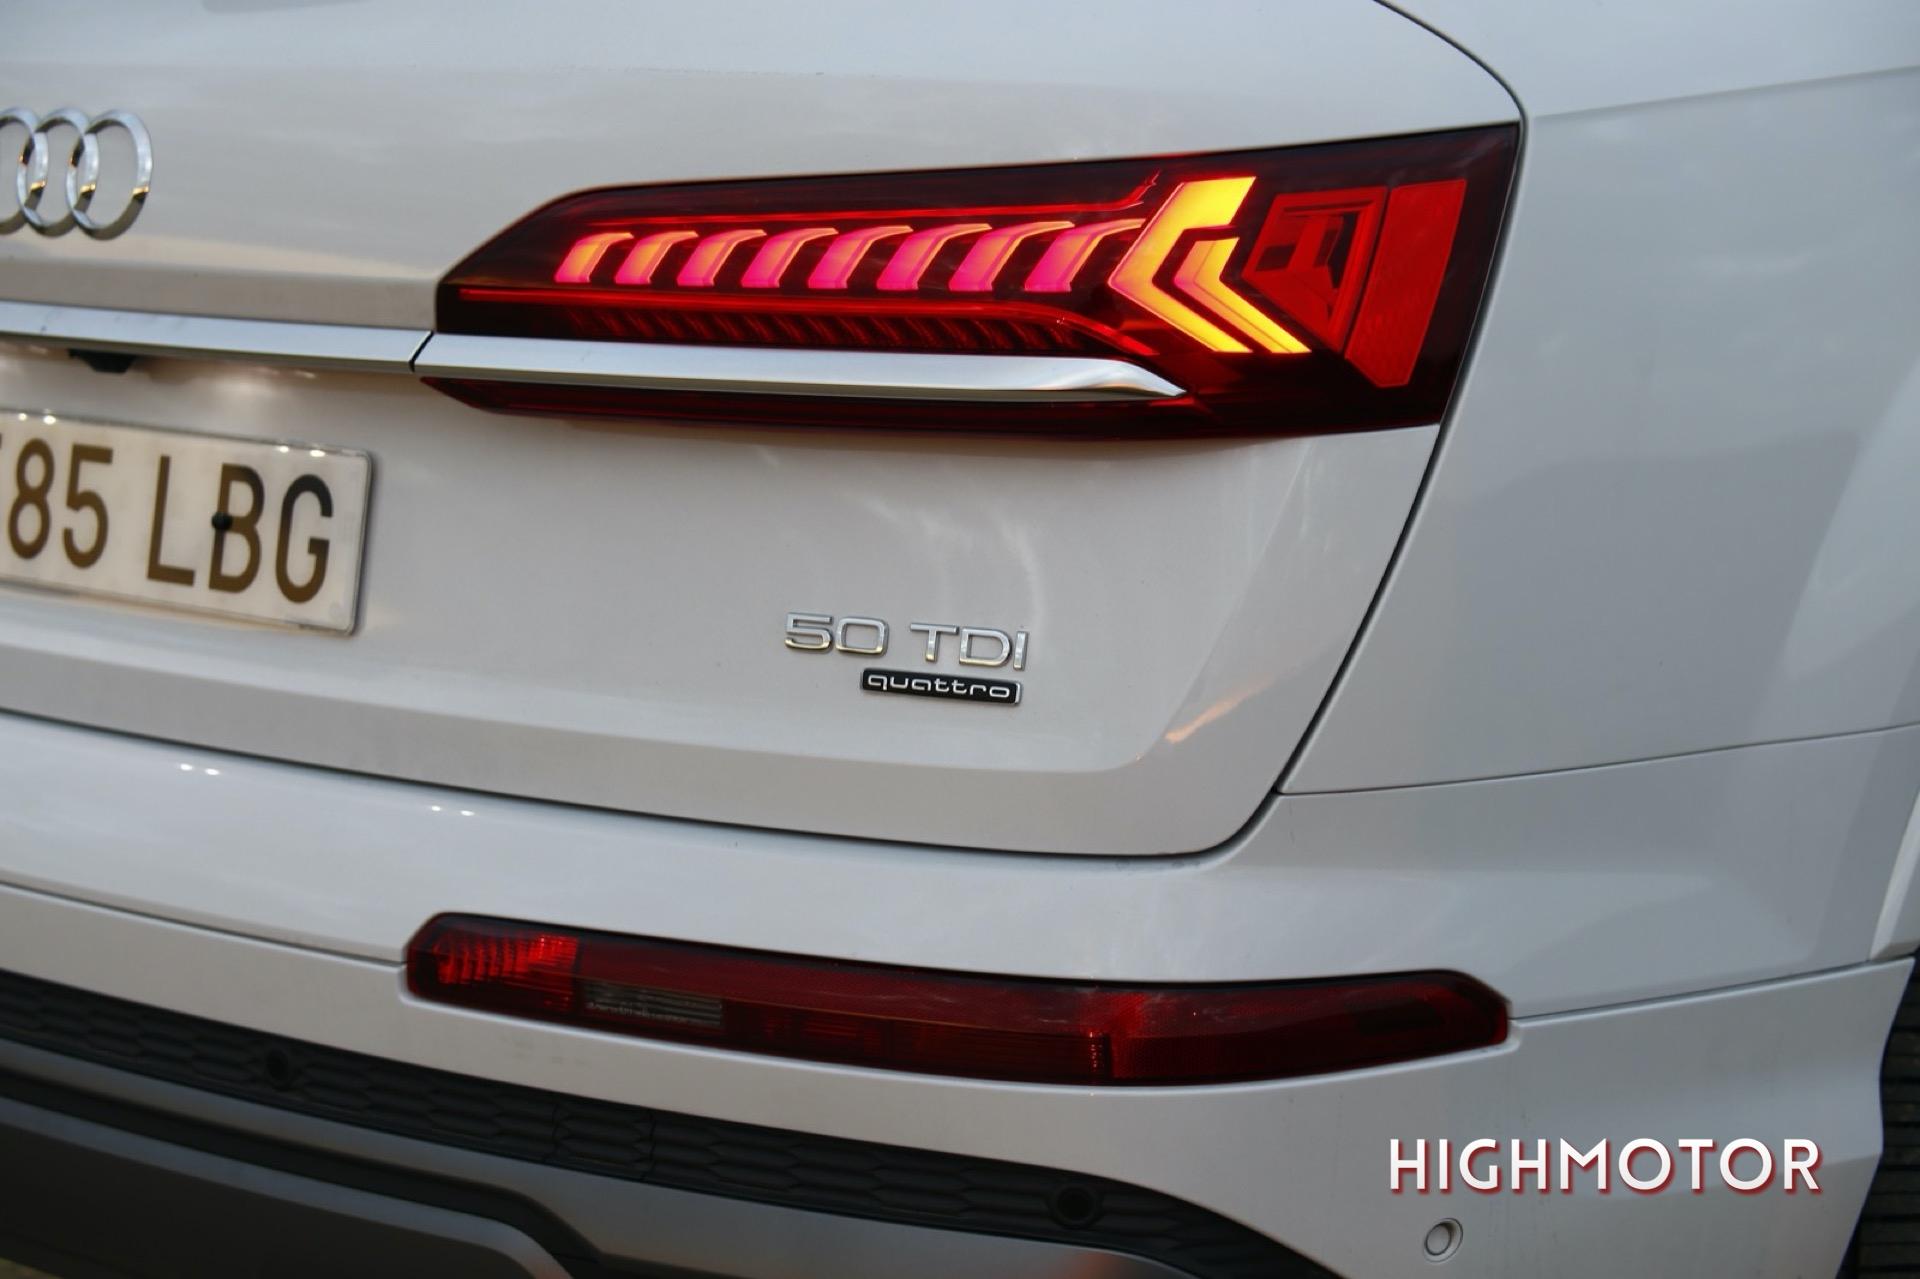 Audi Q7 Tdi 8